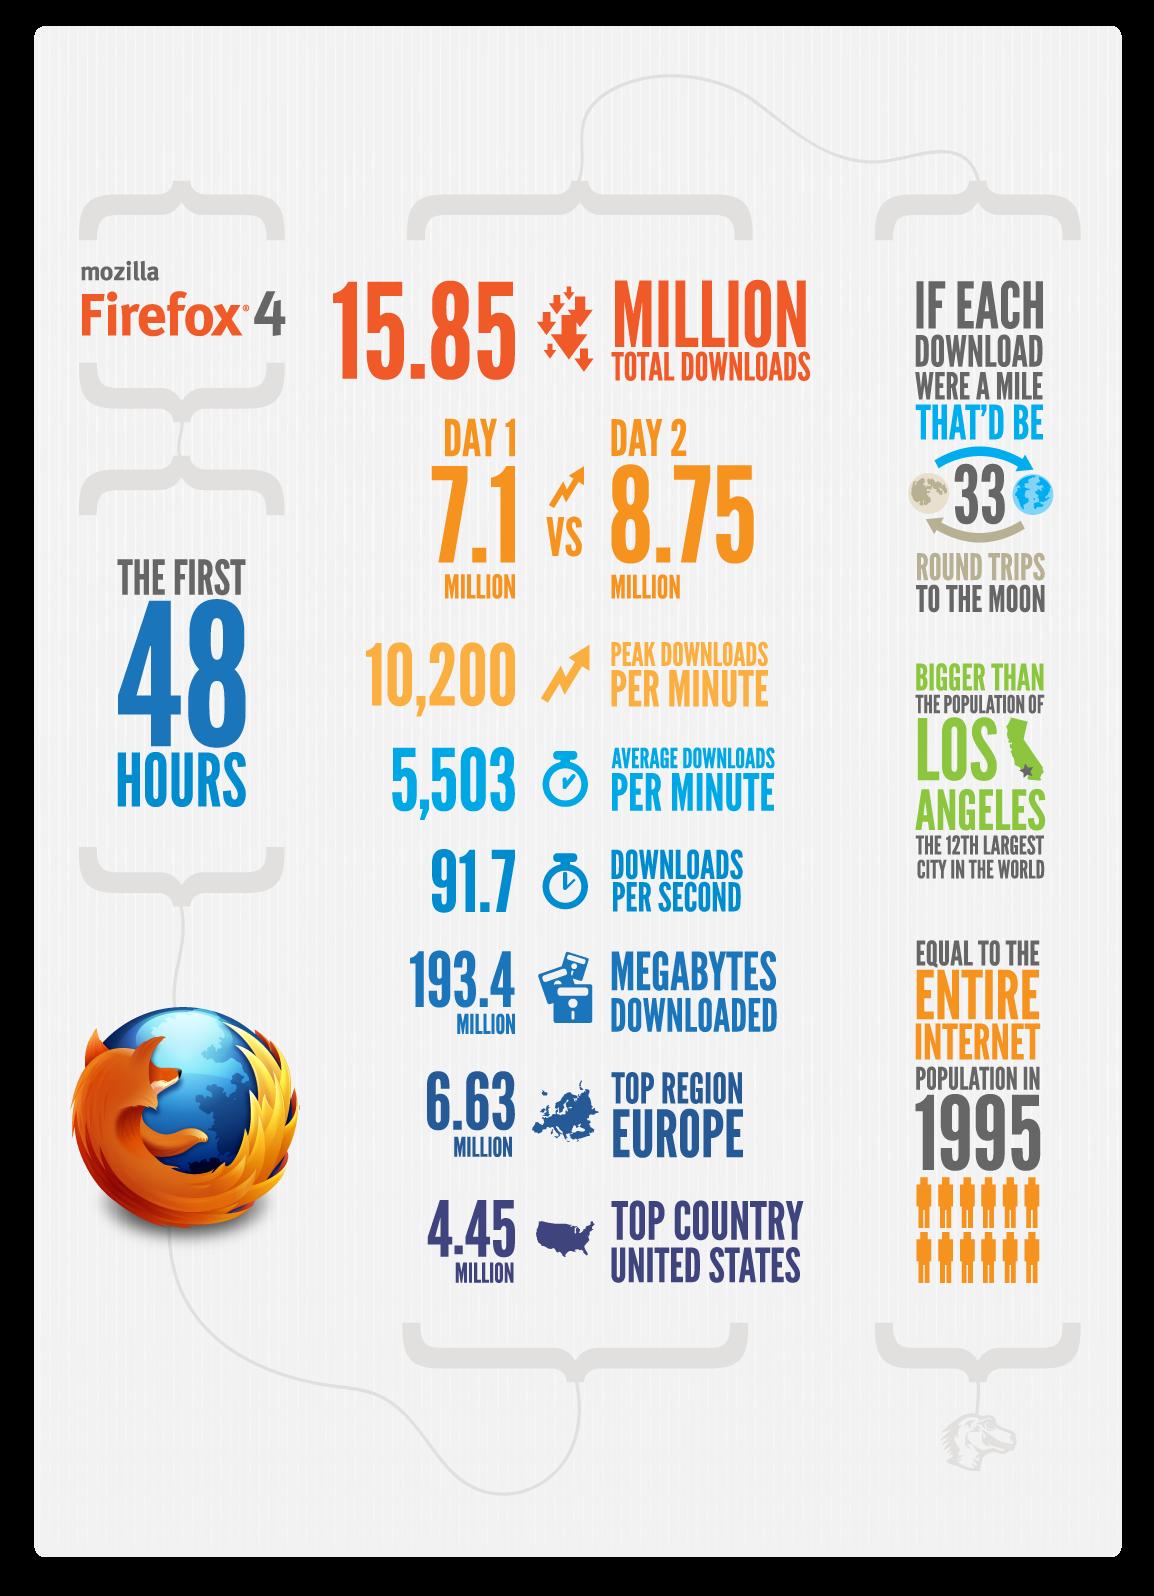 Infografía - Primeras 48 horas de Firefox 4